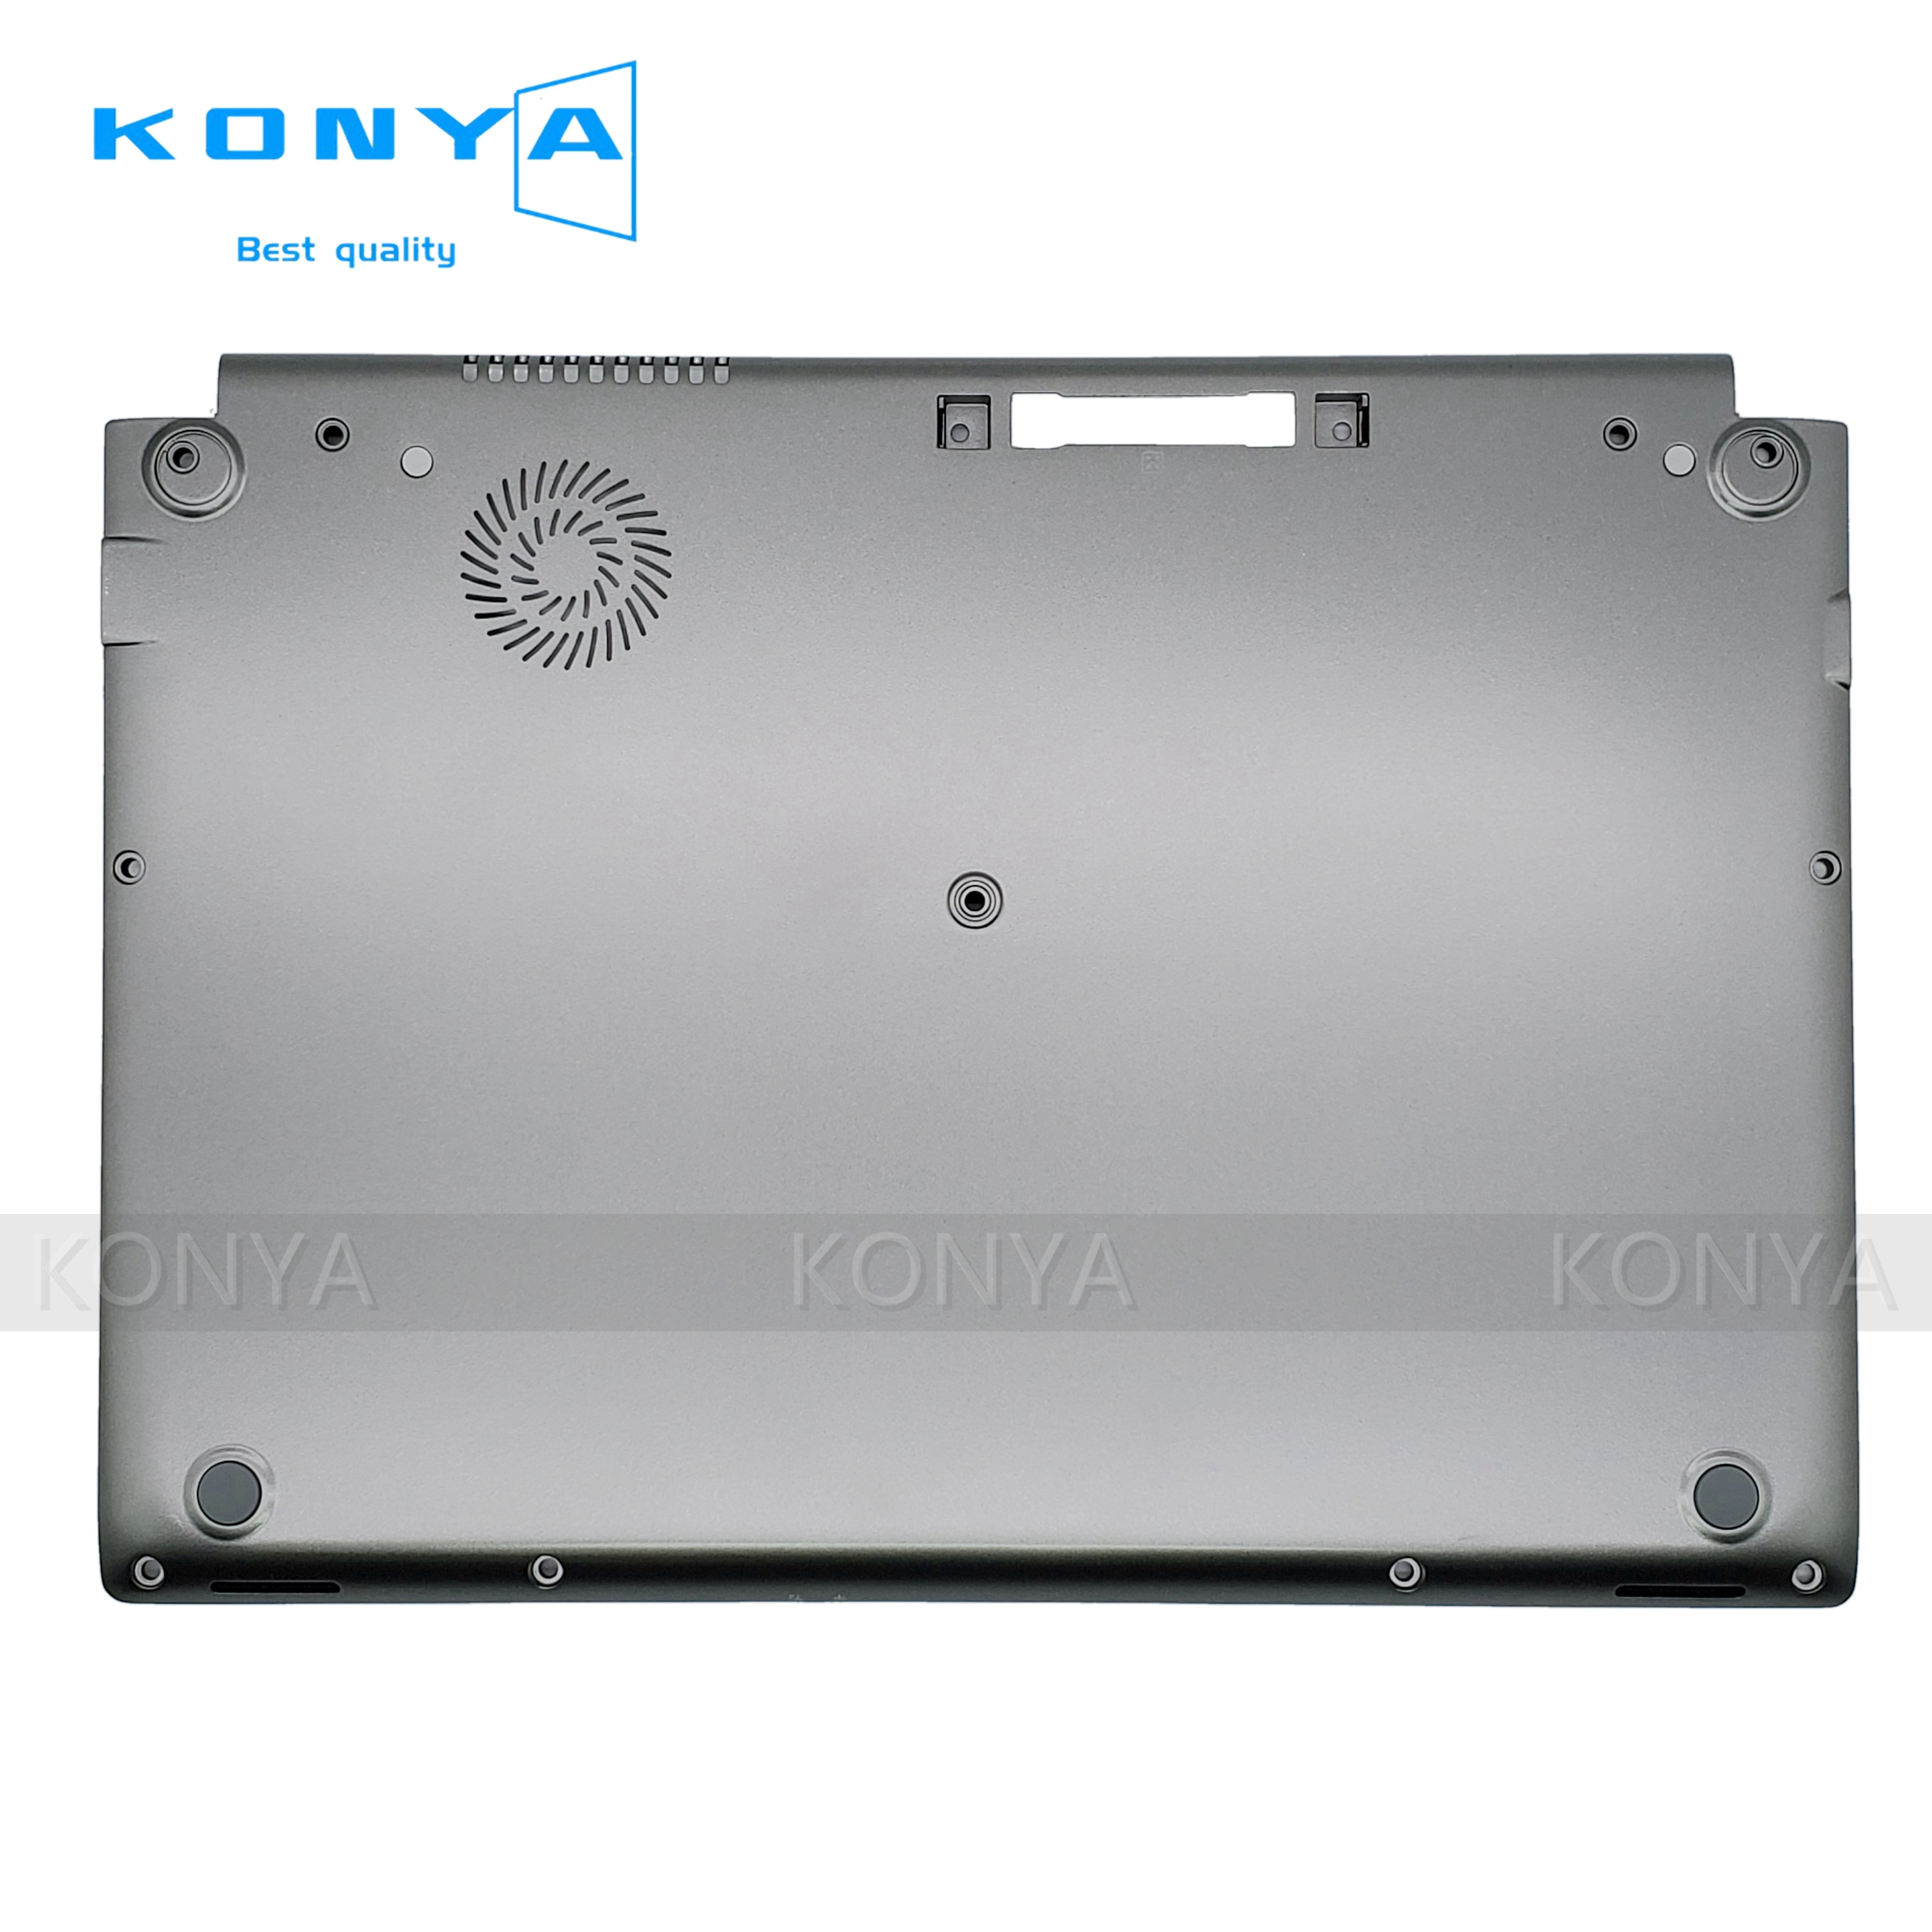 Cubierta inferior Original para portátil, cubierta de la Base para Toshiba Portege Z30 Z30-A Z30-A1301